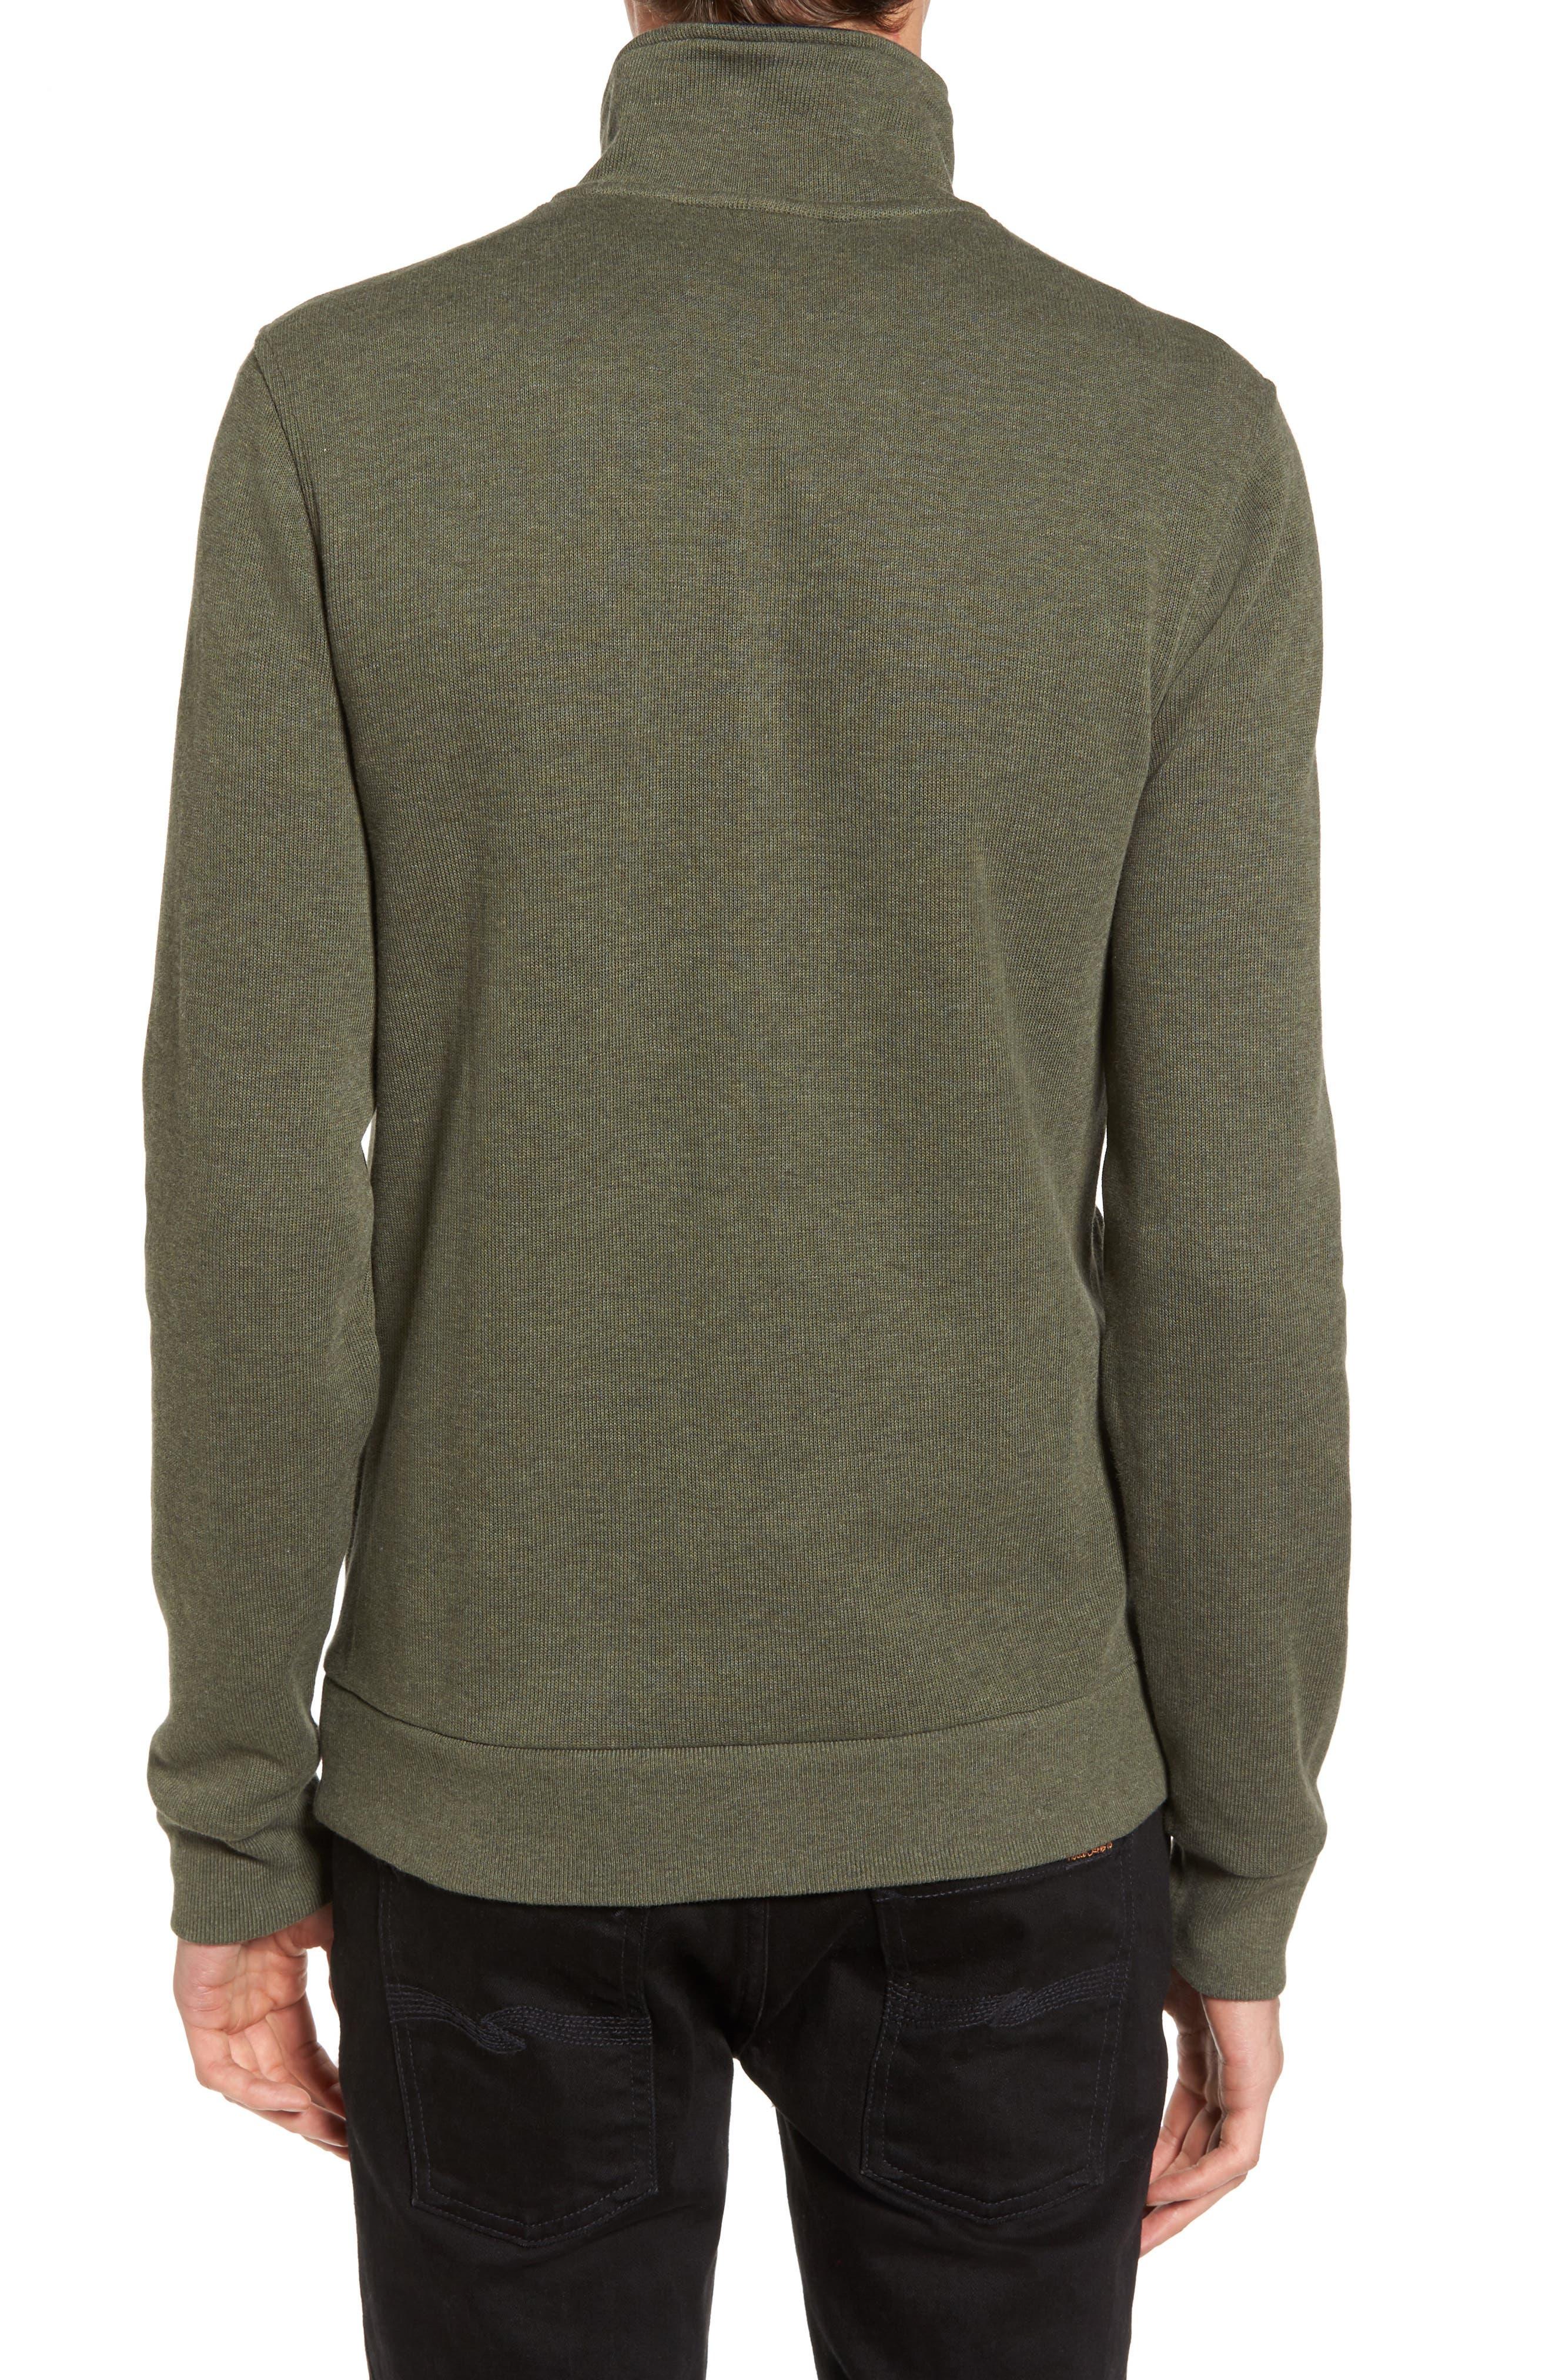 Quarter Zip Sweatshirt,                             Alternate thumbnail 2, color,                             2Qh Army/ Navy Blue